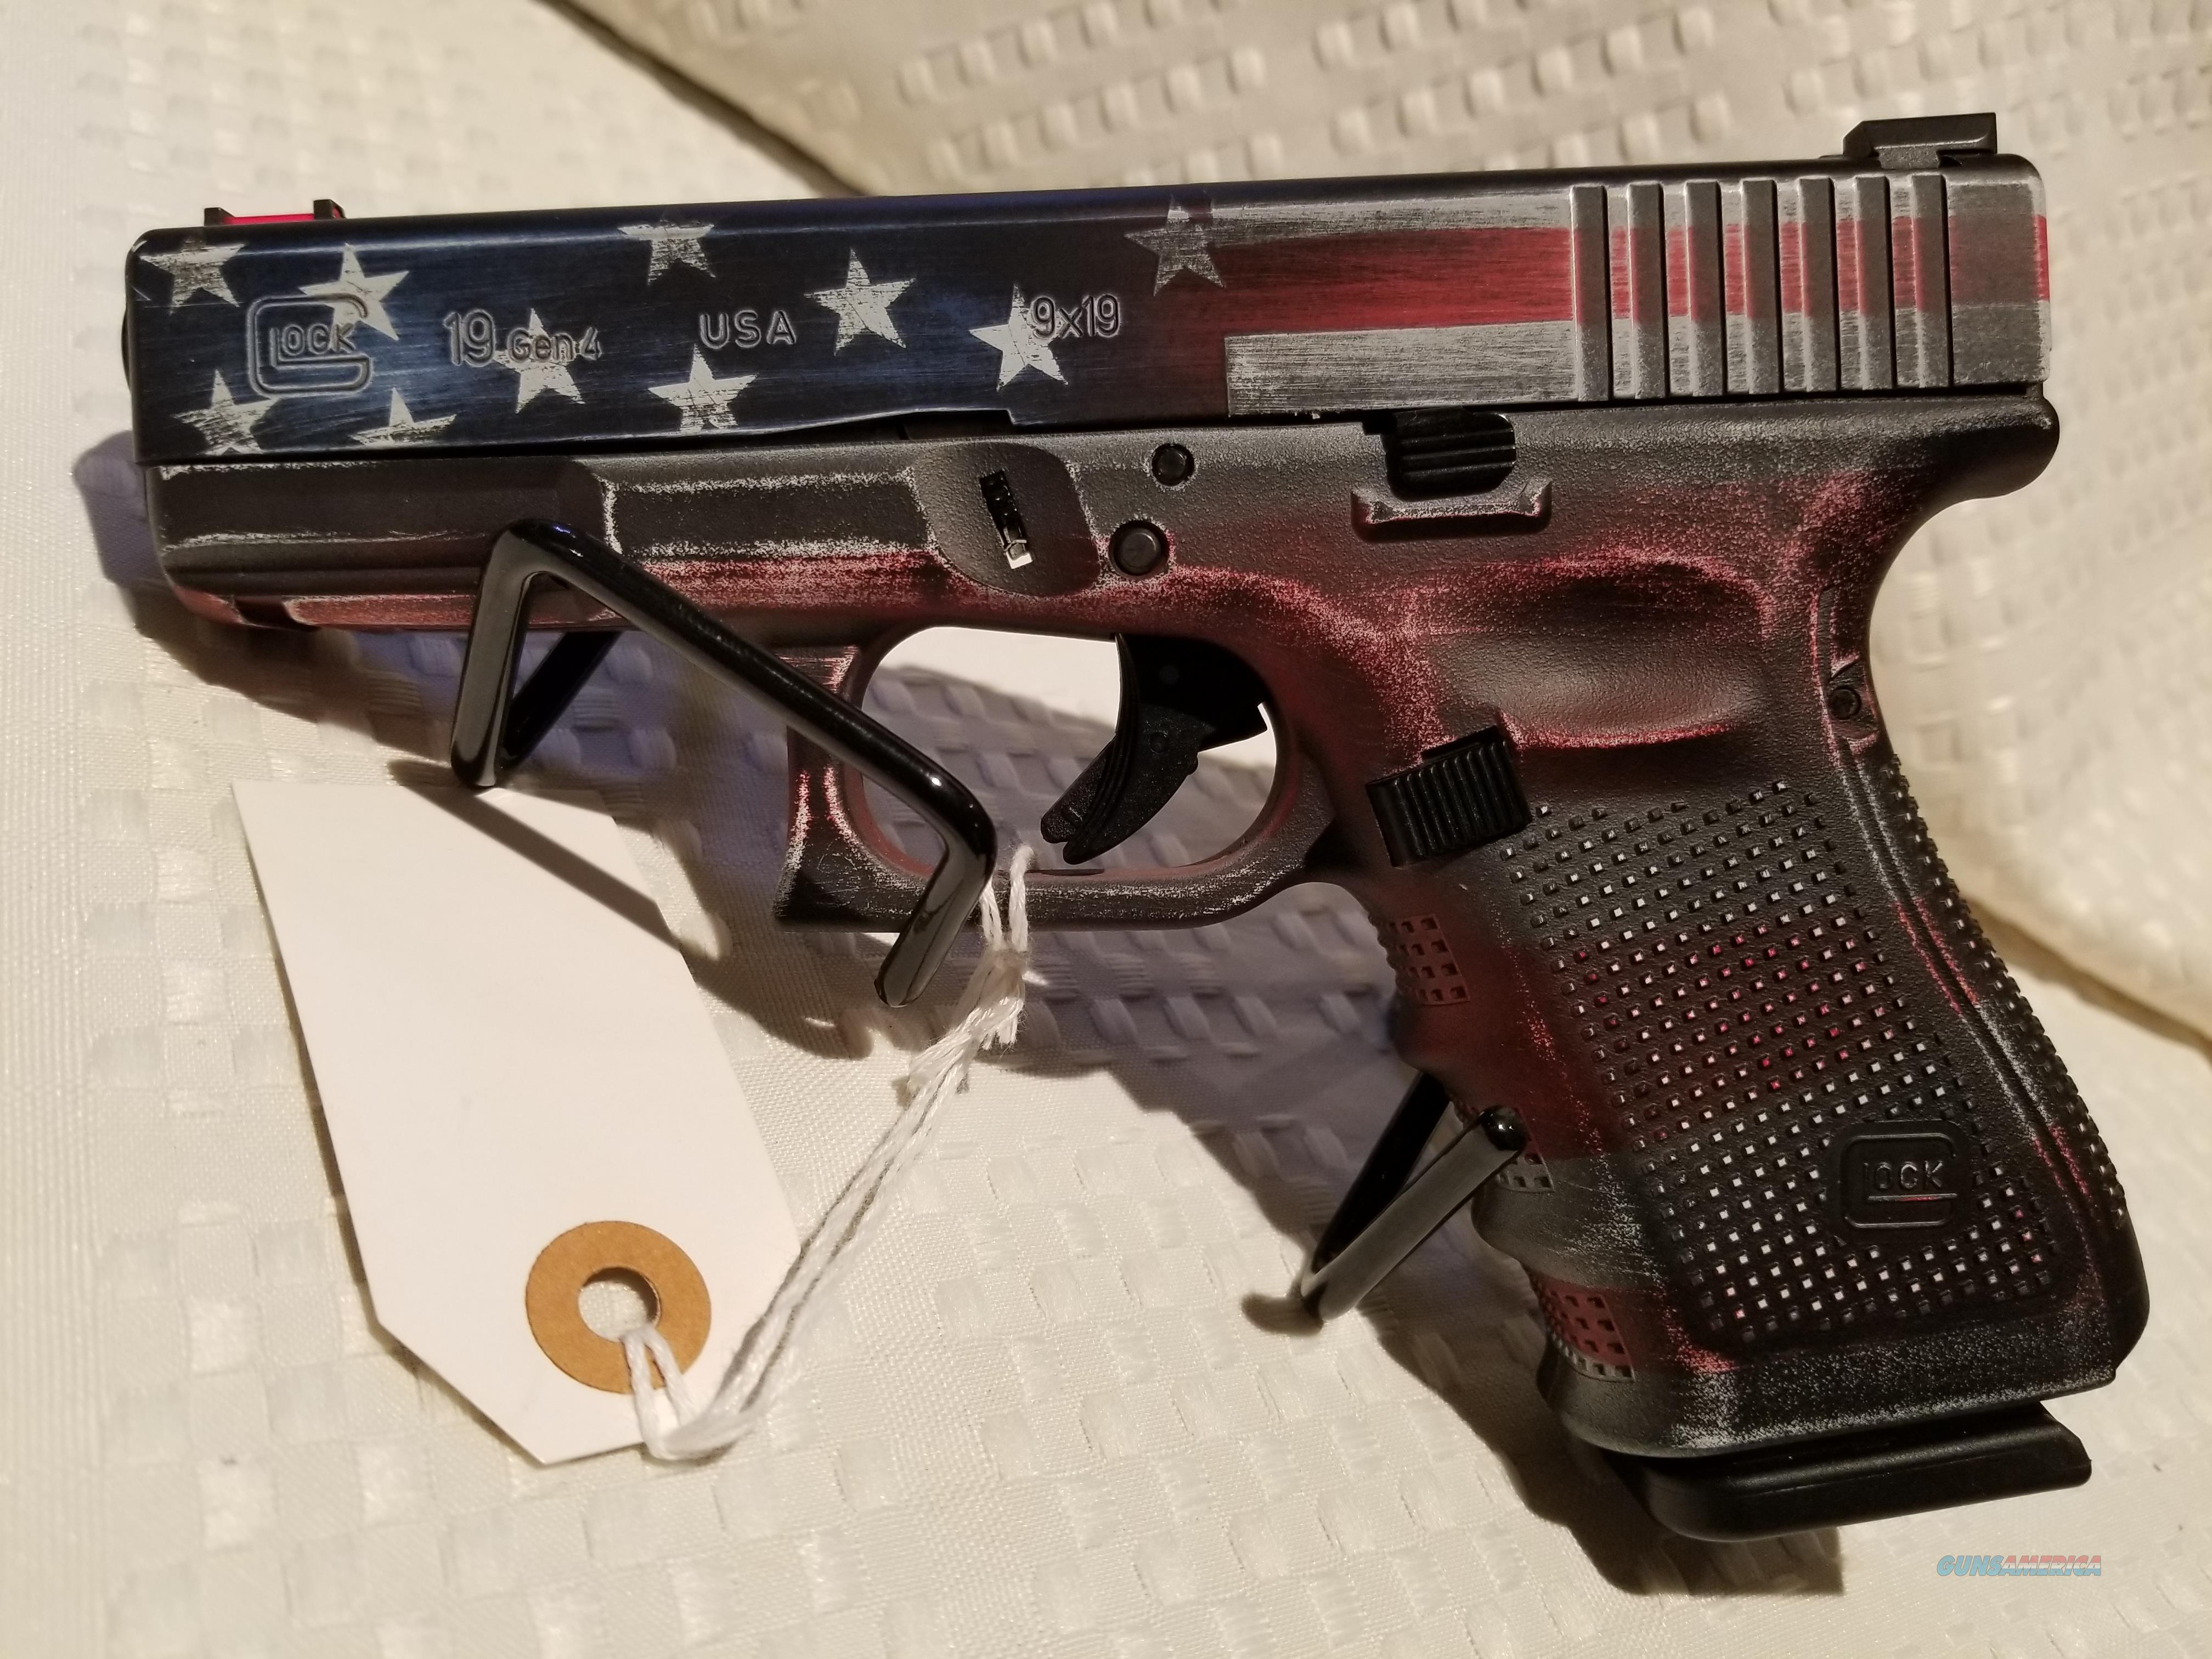 American Flag Cerekote Gen4 Glock 19 Guns Pistols